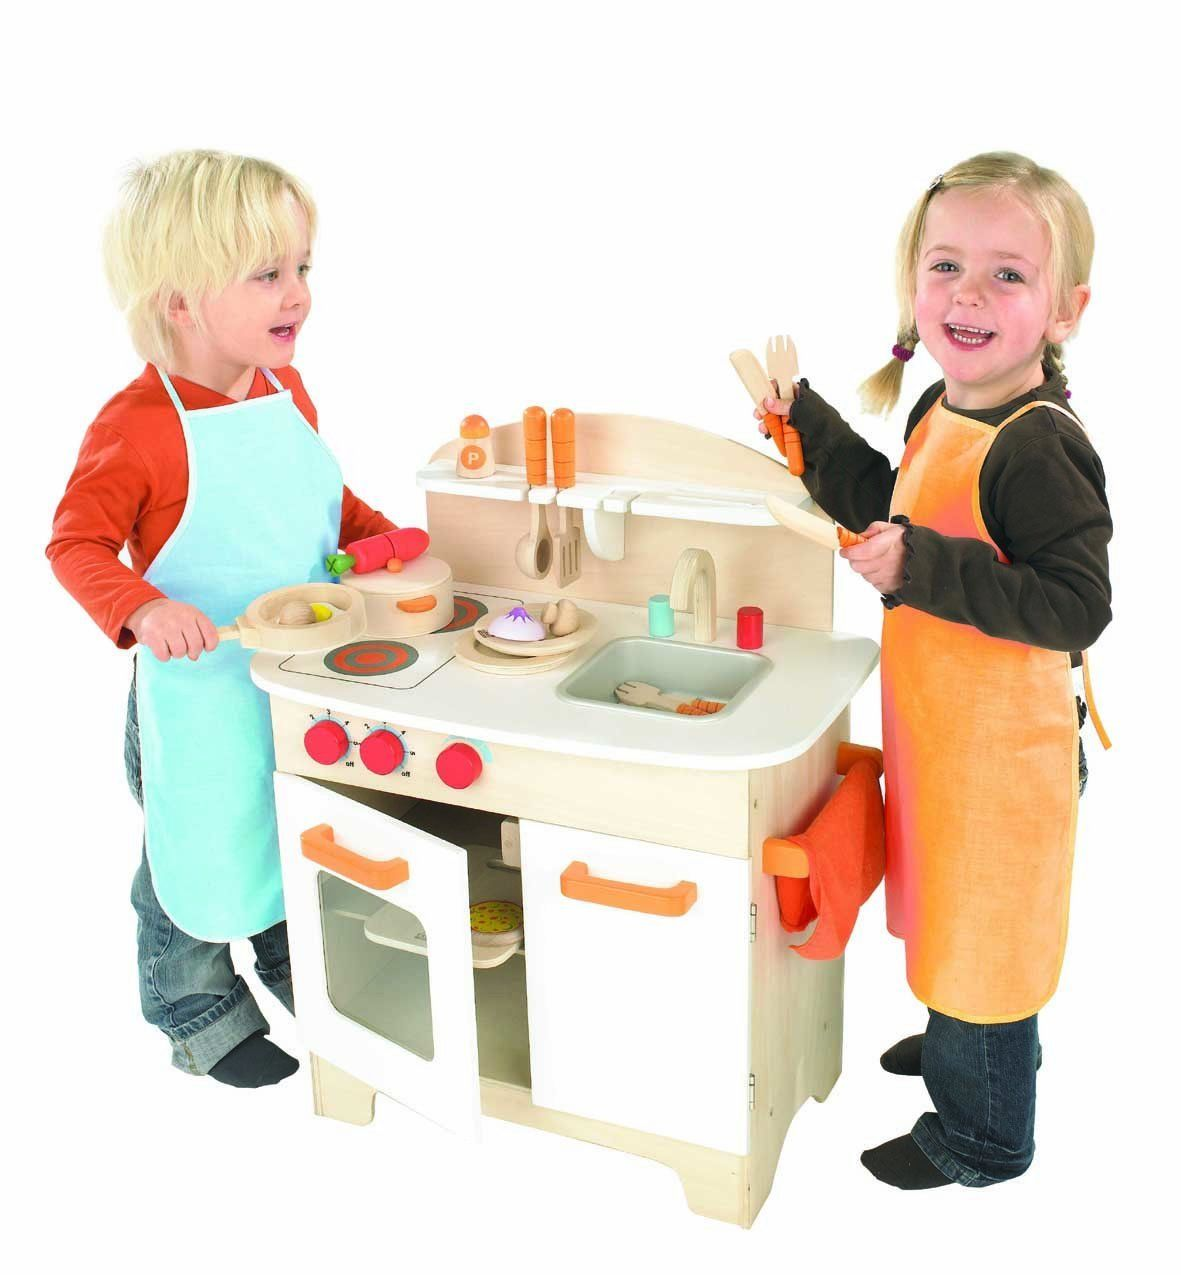 Amazon.com: Hape Gourmet kitchen - White: Toys & Games | Kids stuff ...